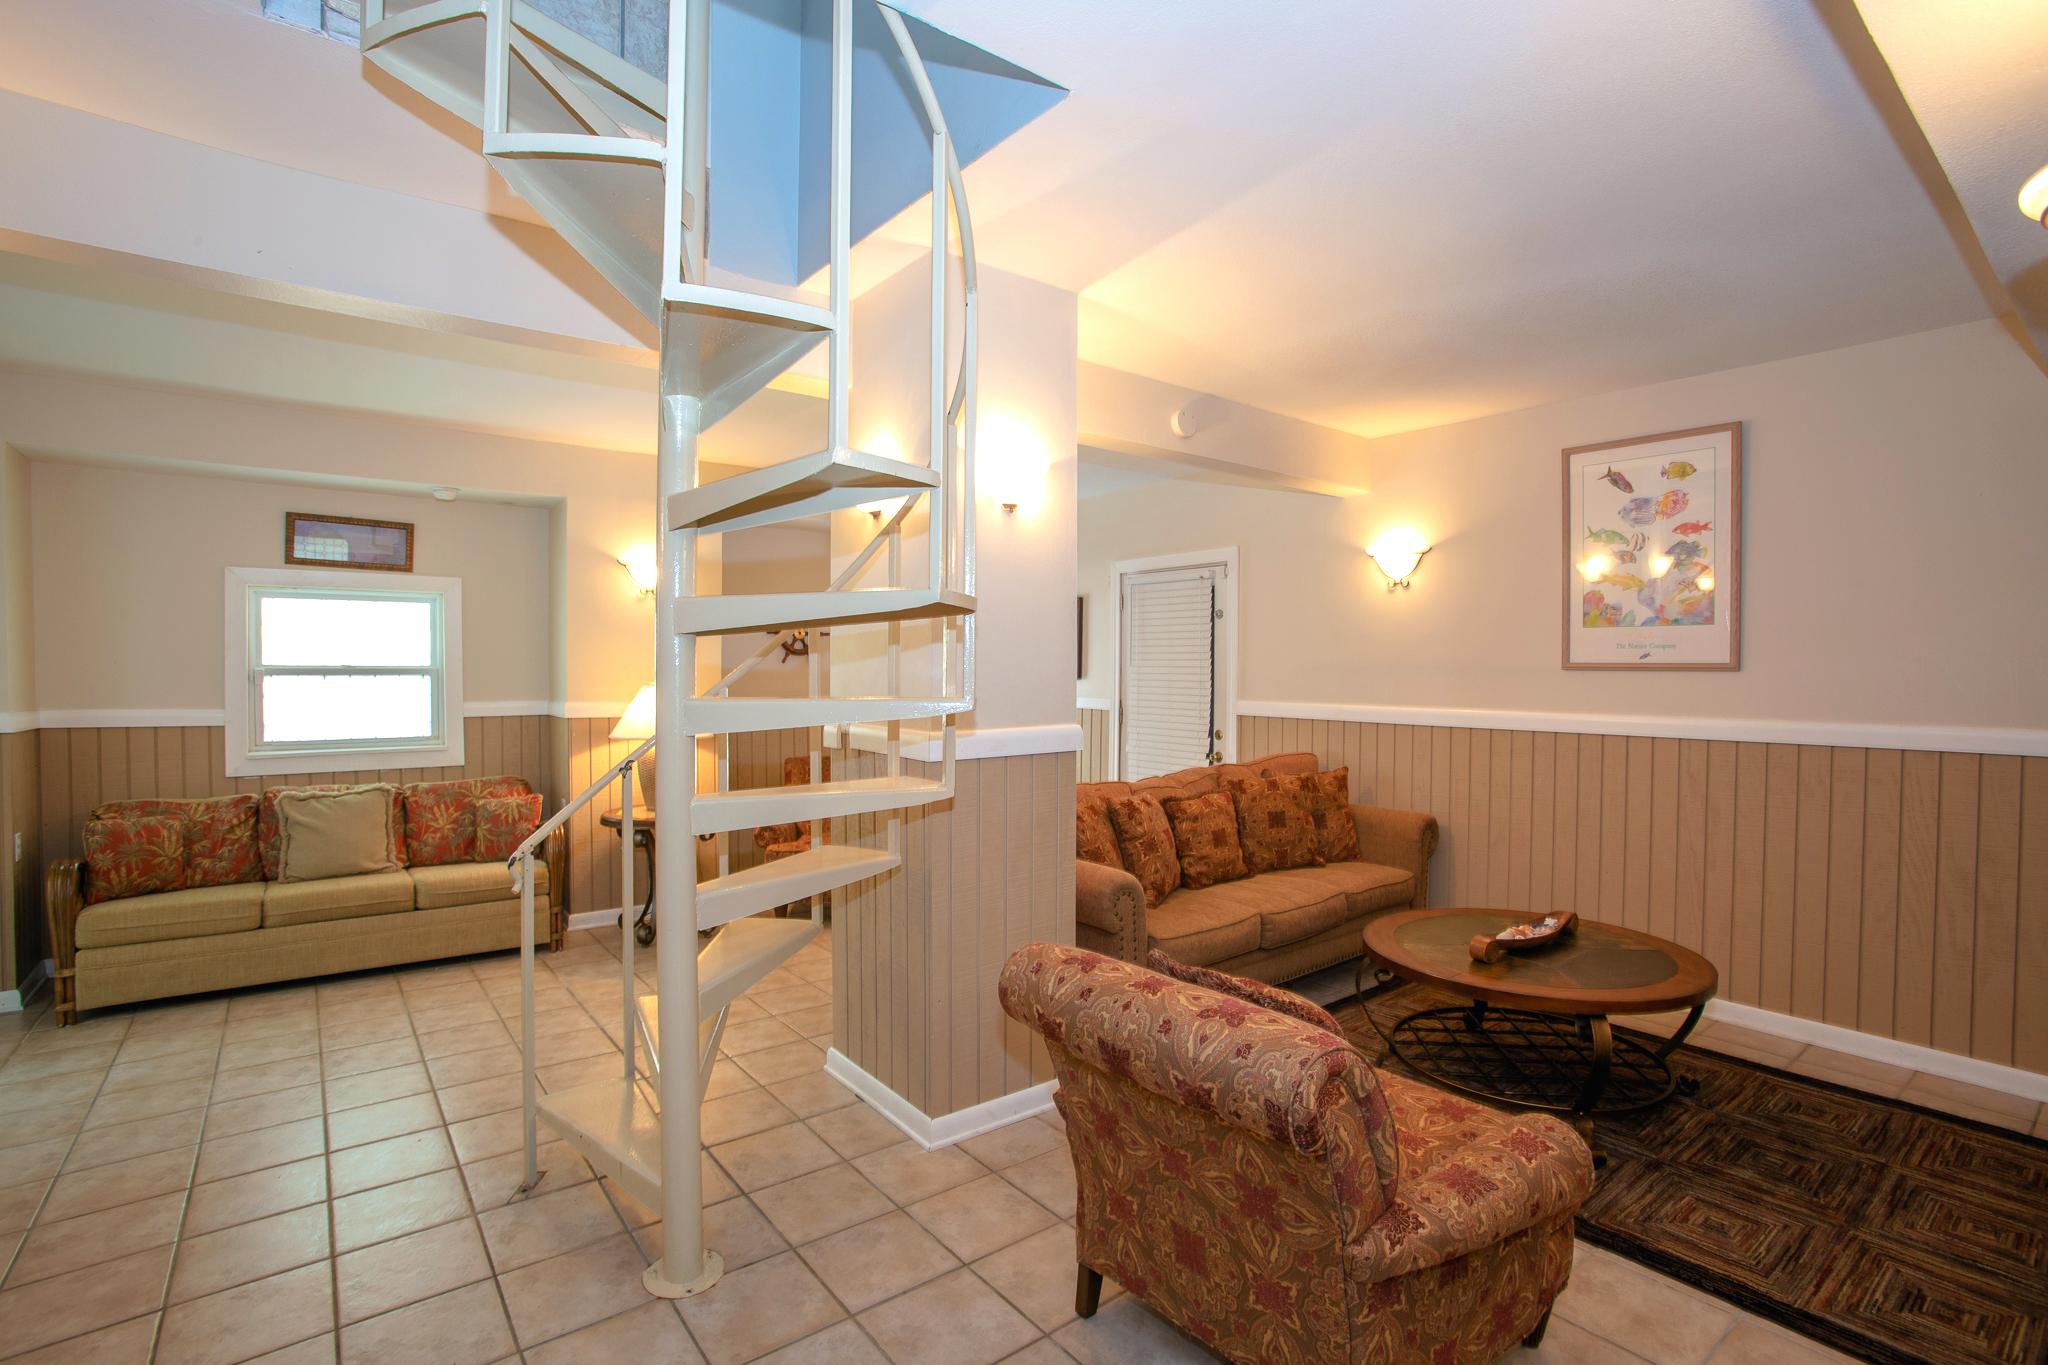 Maldonado 1015 - Sea the Big Picture House/Cottage rental in Pensacola Beach House Rentals in Pensacola Beach Florida - #20